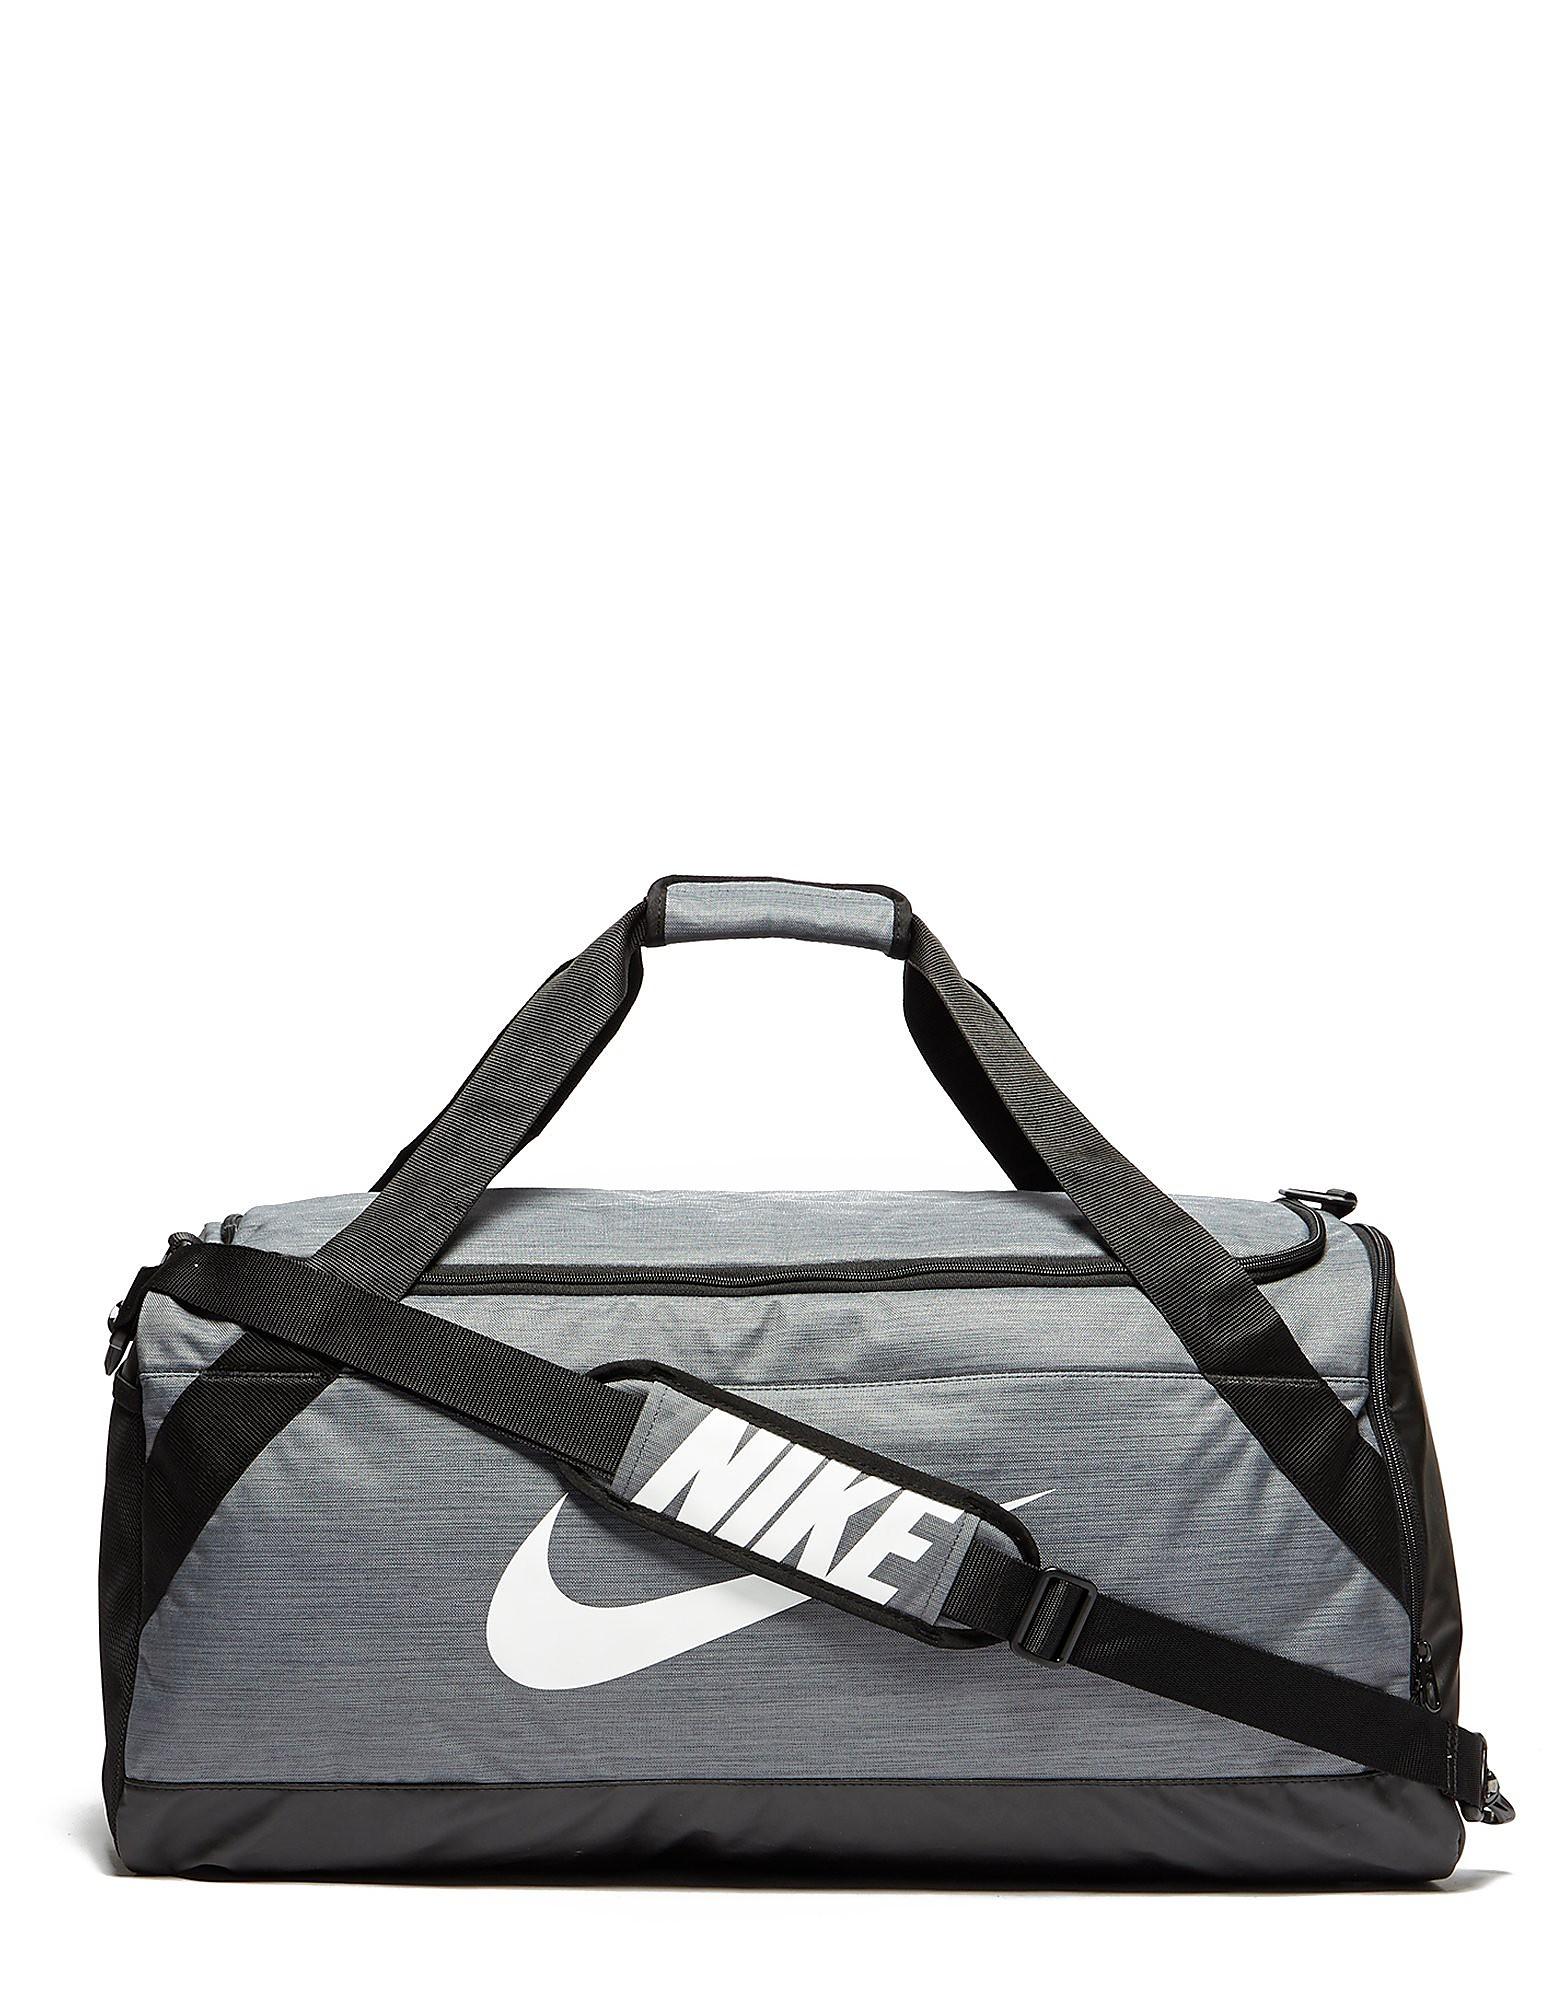 Nike Large Brasilia Tasche Grau-Schwarz